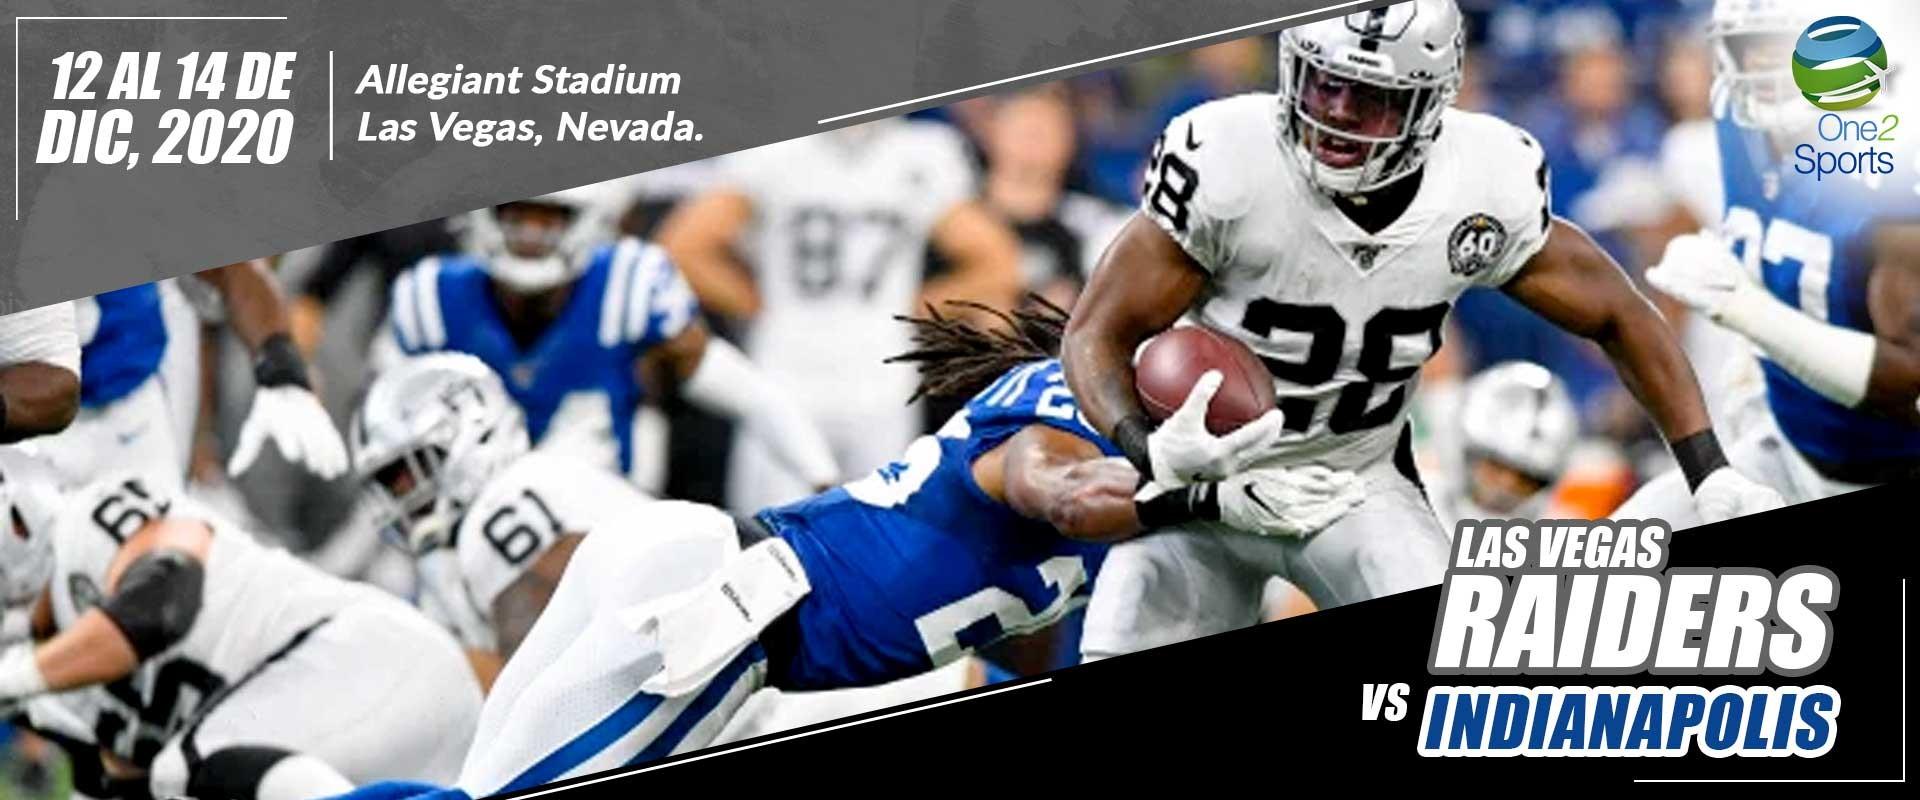 Las Vegas Raiders vs Indianapolis